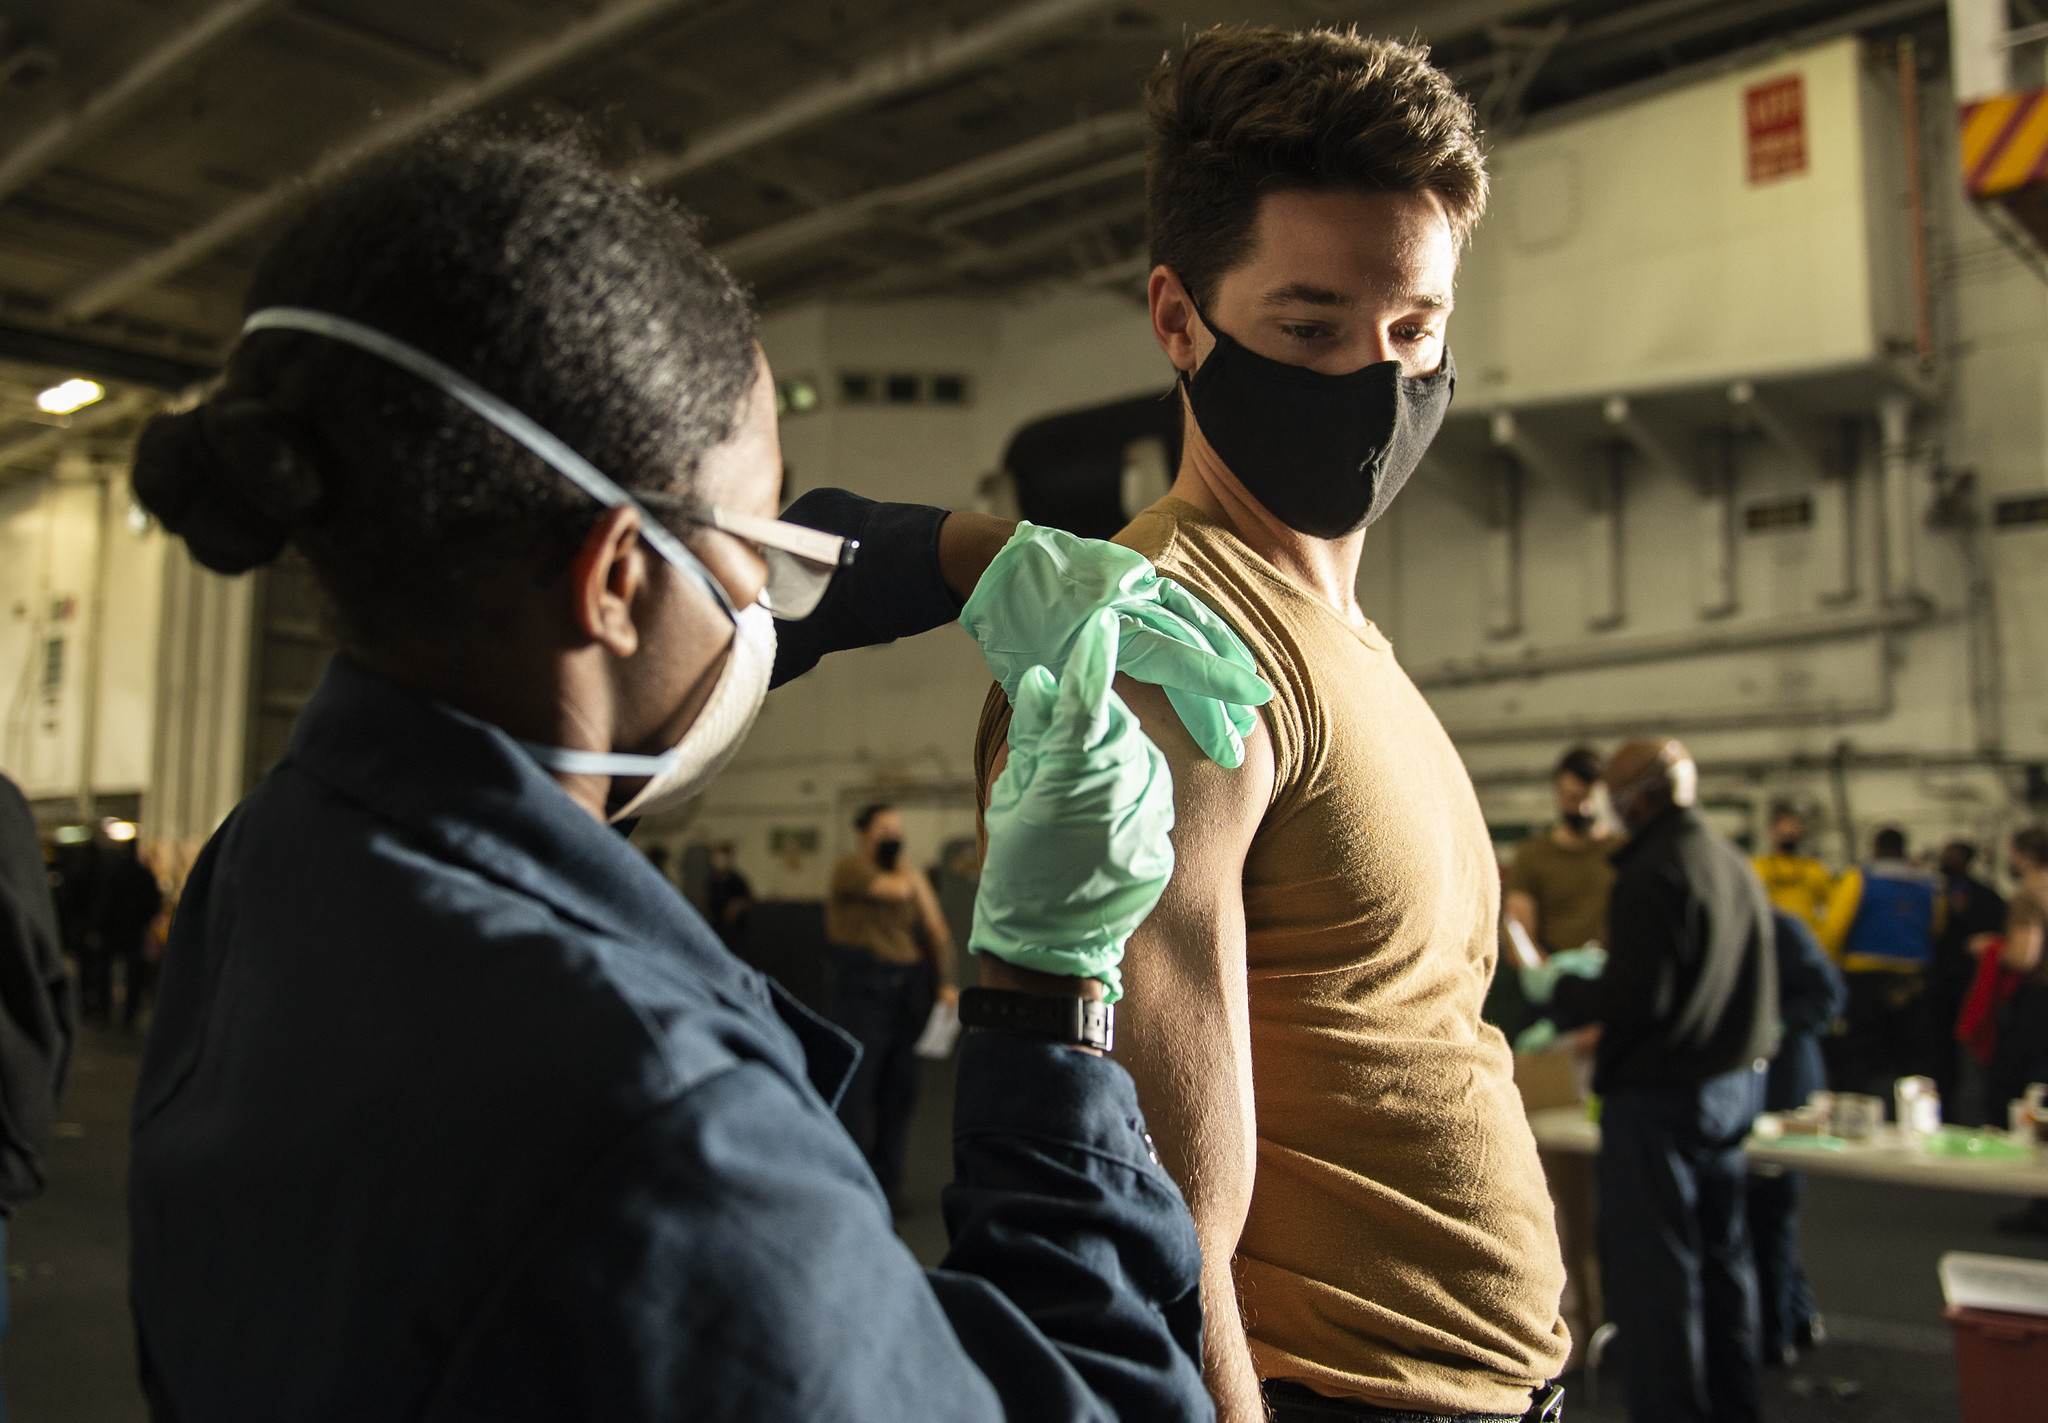 Aviation Ordnanceman Airman Michael Beatty, right, receives an influenza vaccine from Hospitalman Glenda Martinez on Nov. 20, 2020, in the hangar bay of the aircraft carrier USS Carl Vinson (CVN 70) in the Pacific Ocean. (MC2 Ellen E. Sharkey/Navy)